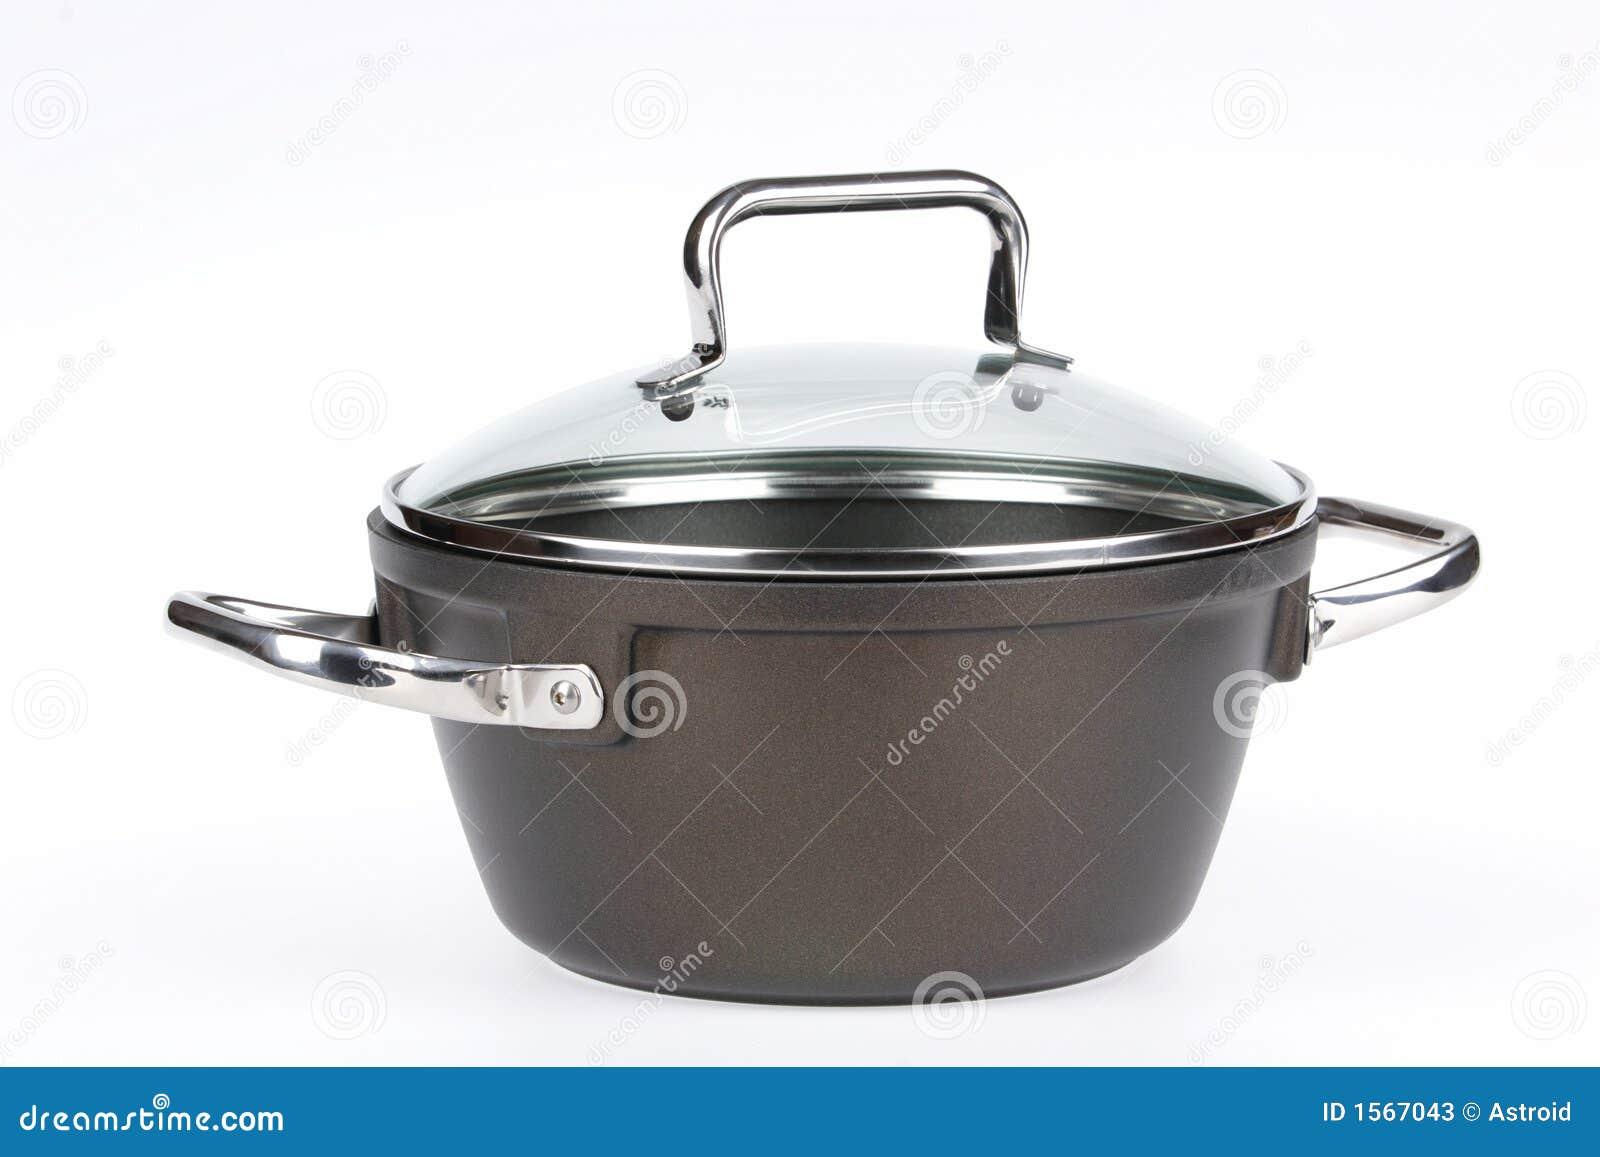 kitchen dishes, saucepan stock photos - image: 1567043